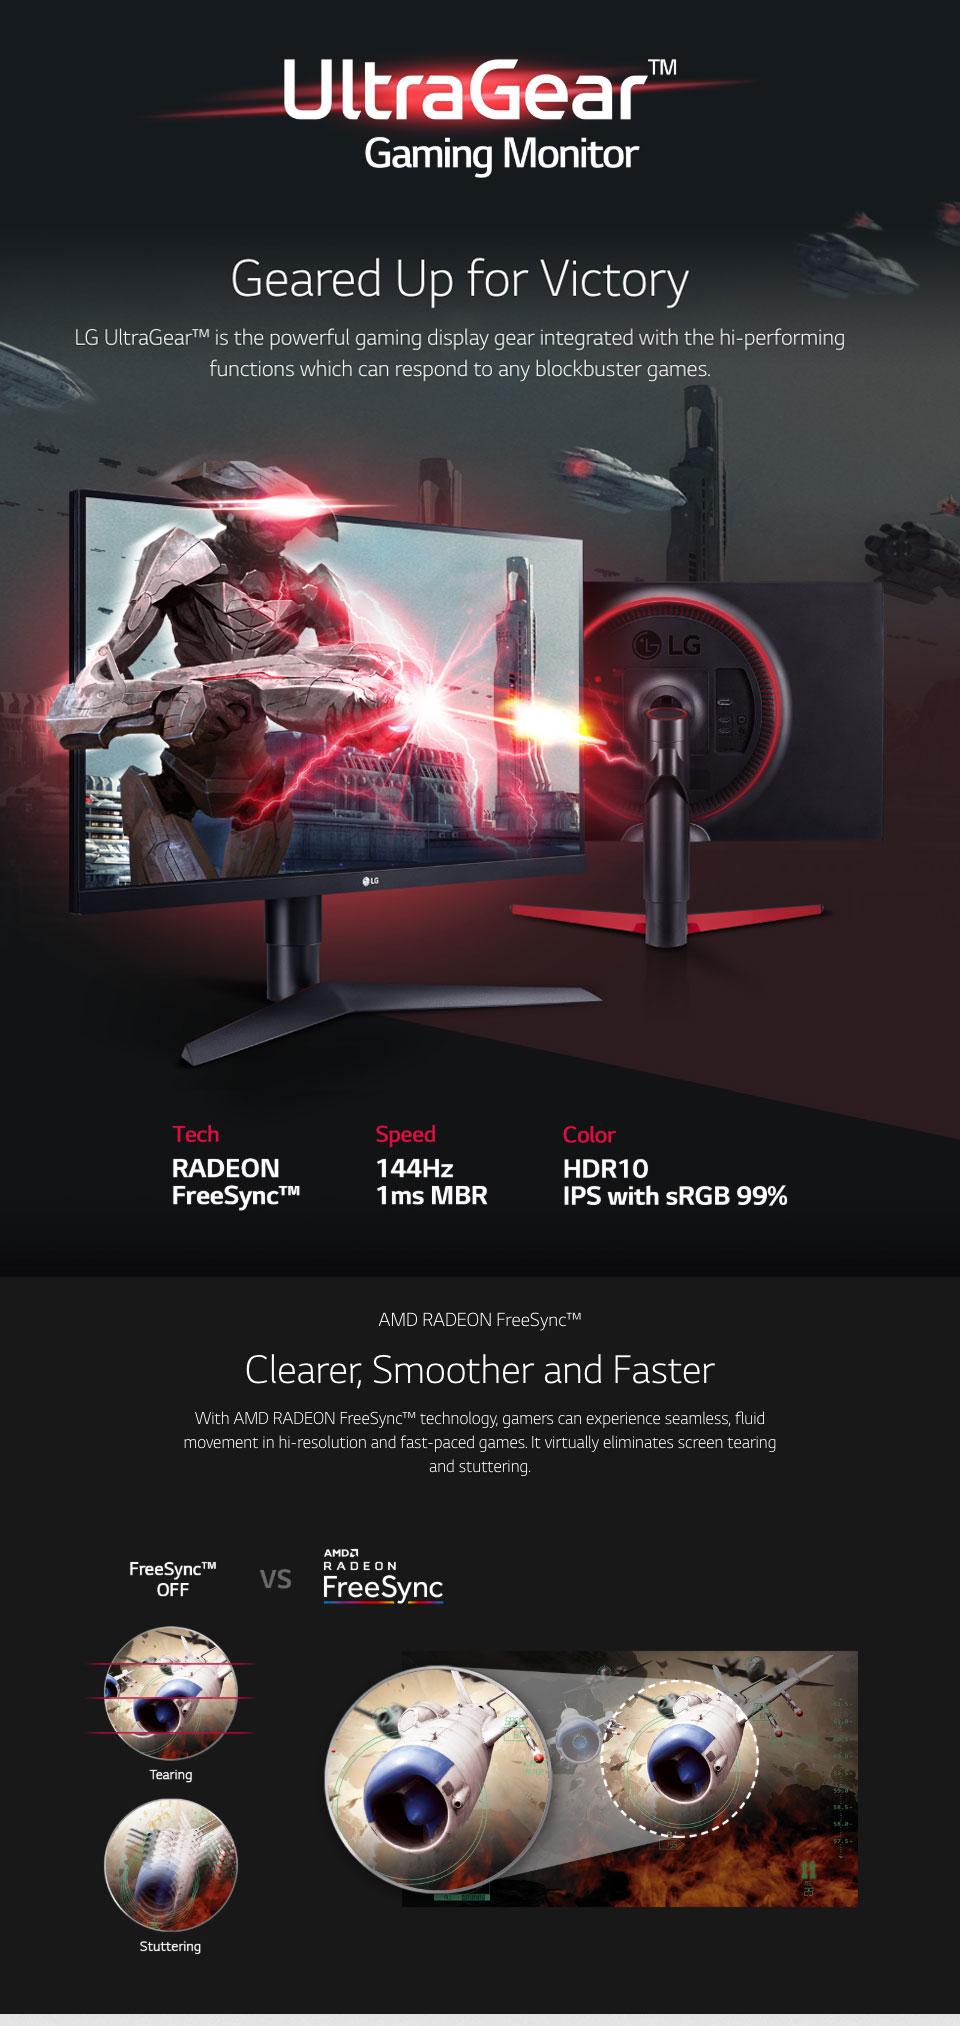 מסך גיימינג LG UltraGear 27GL650 FHD 144Hz FreeSync HDR IPS 27in Monitor